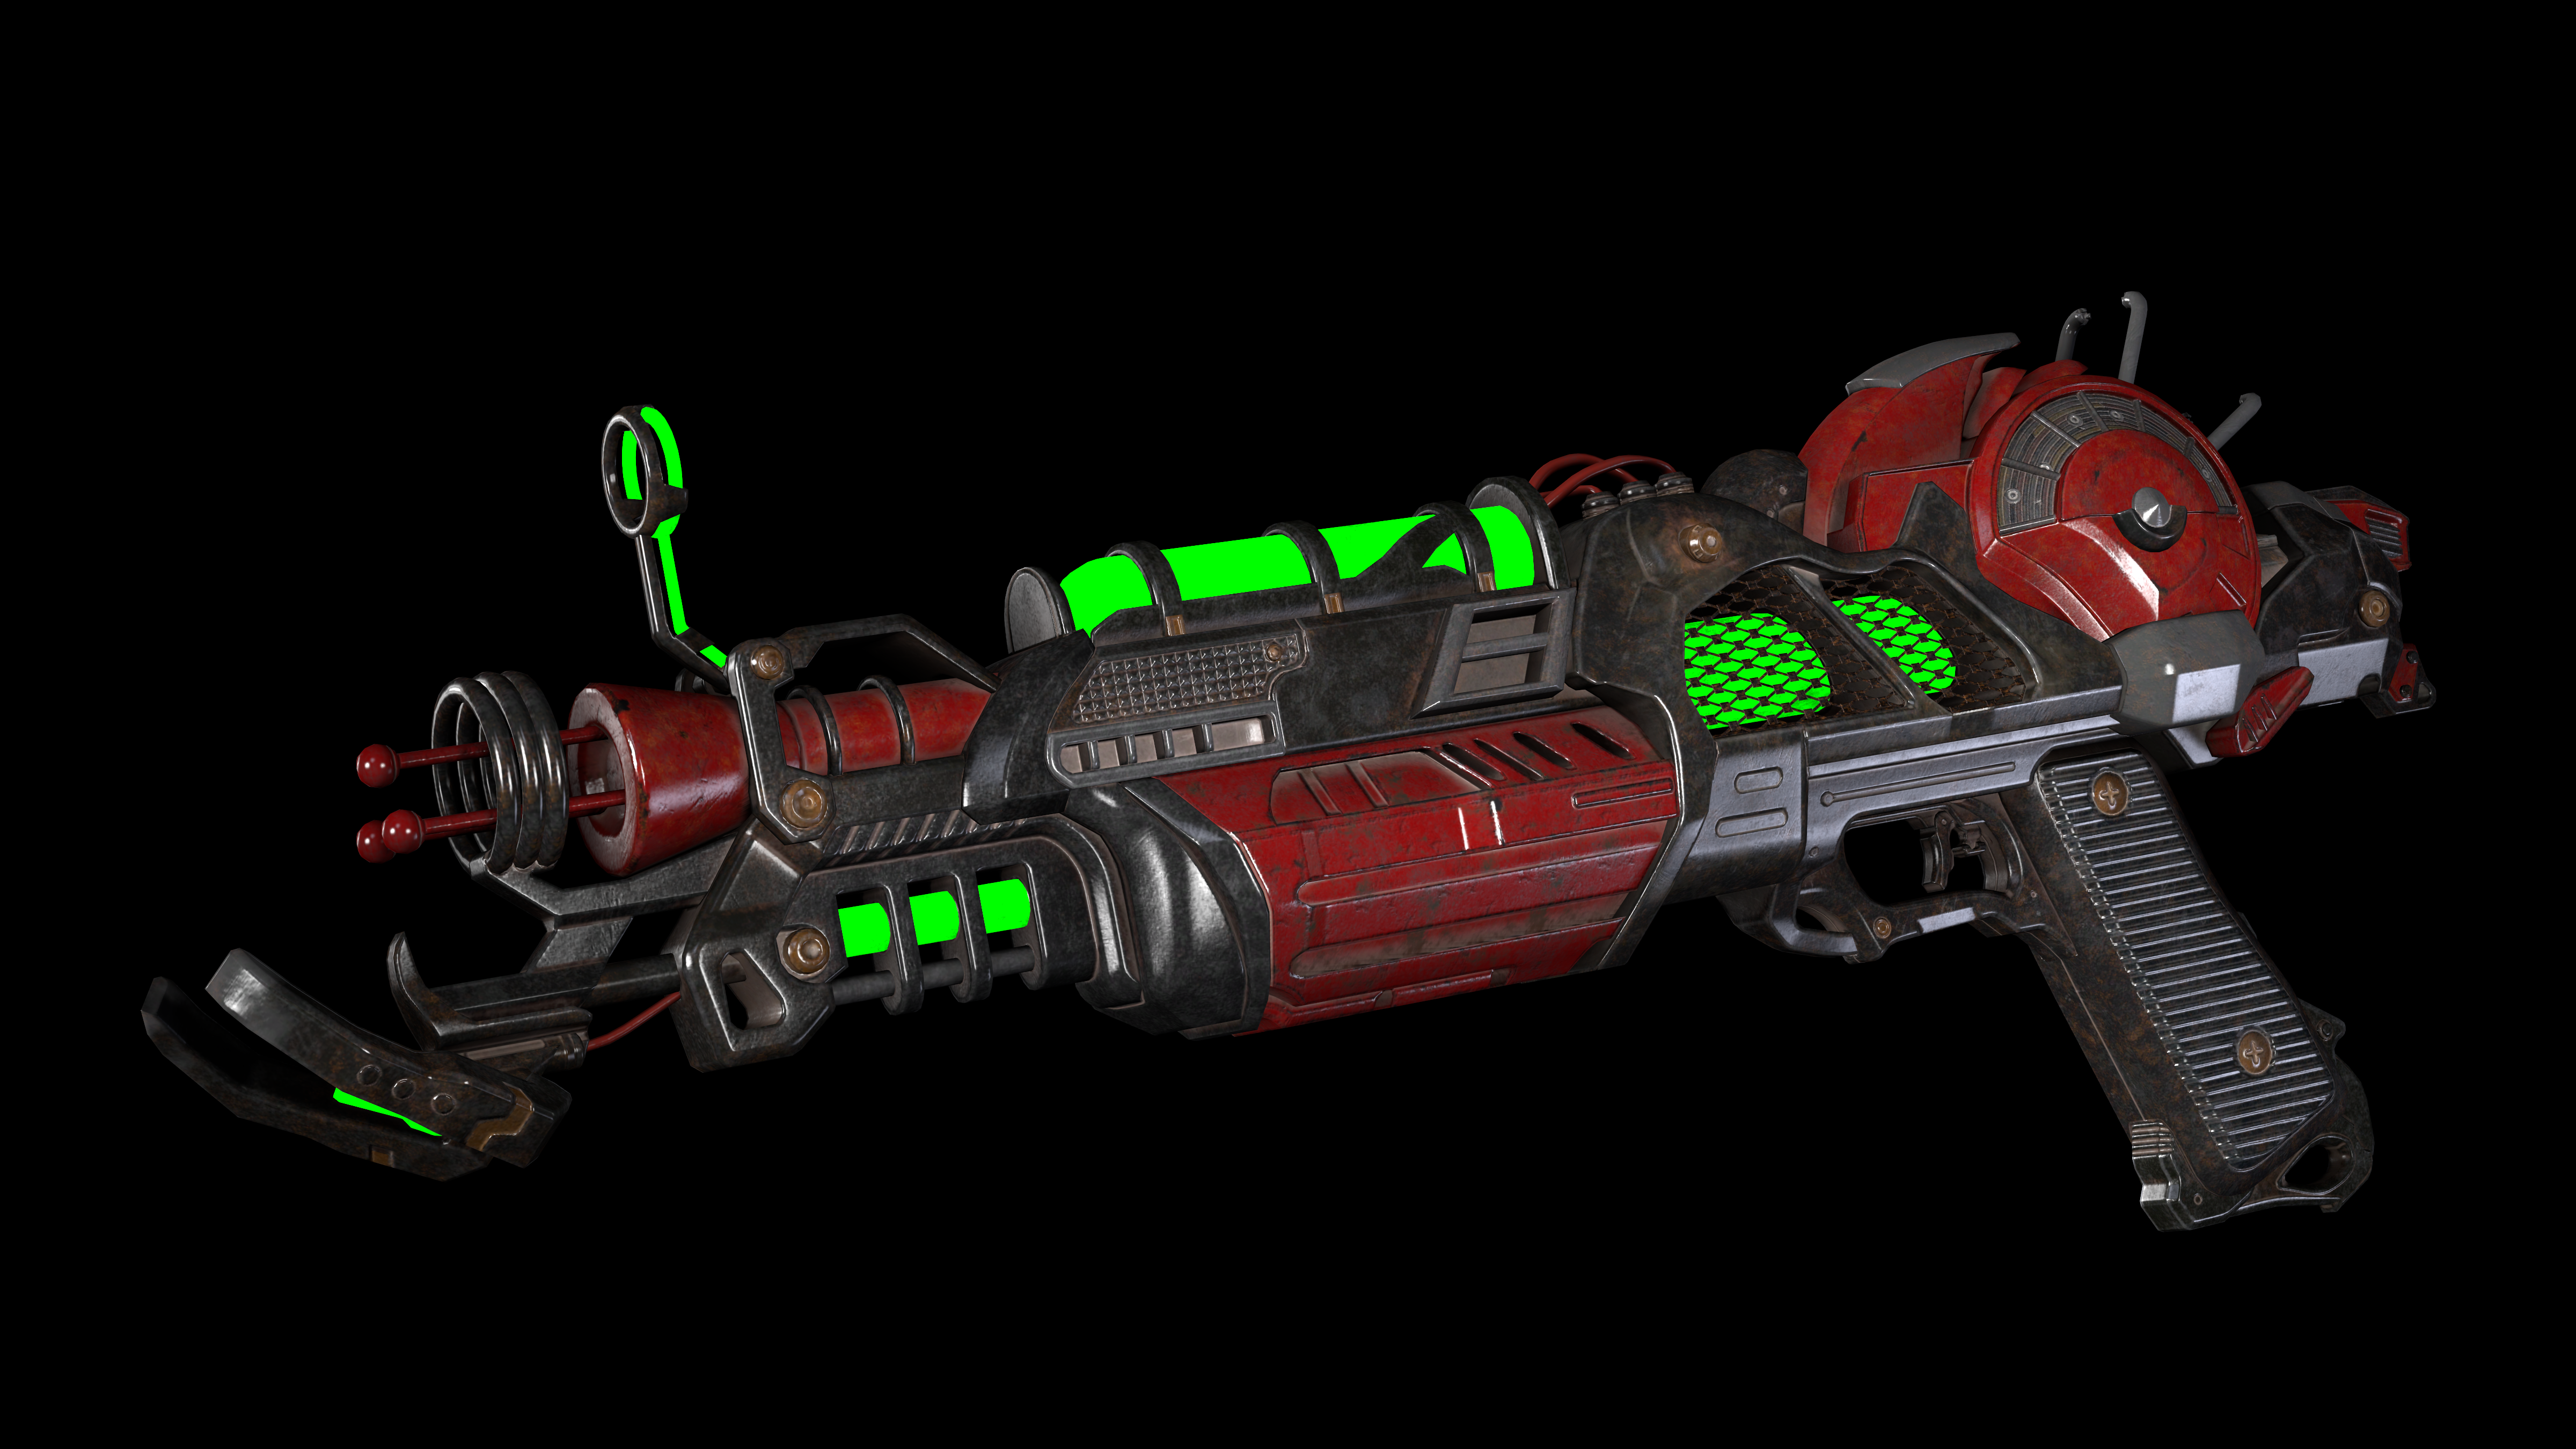 Cod black ops 2 wallpaper guns